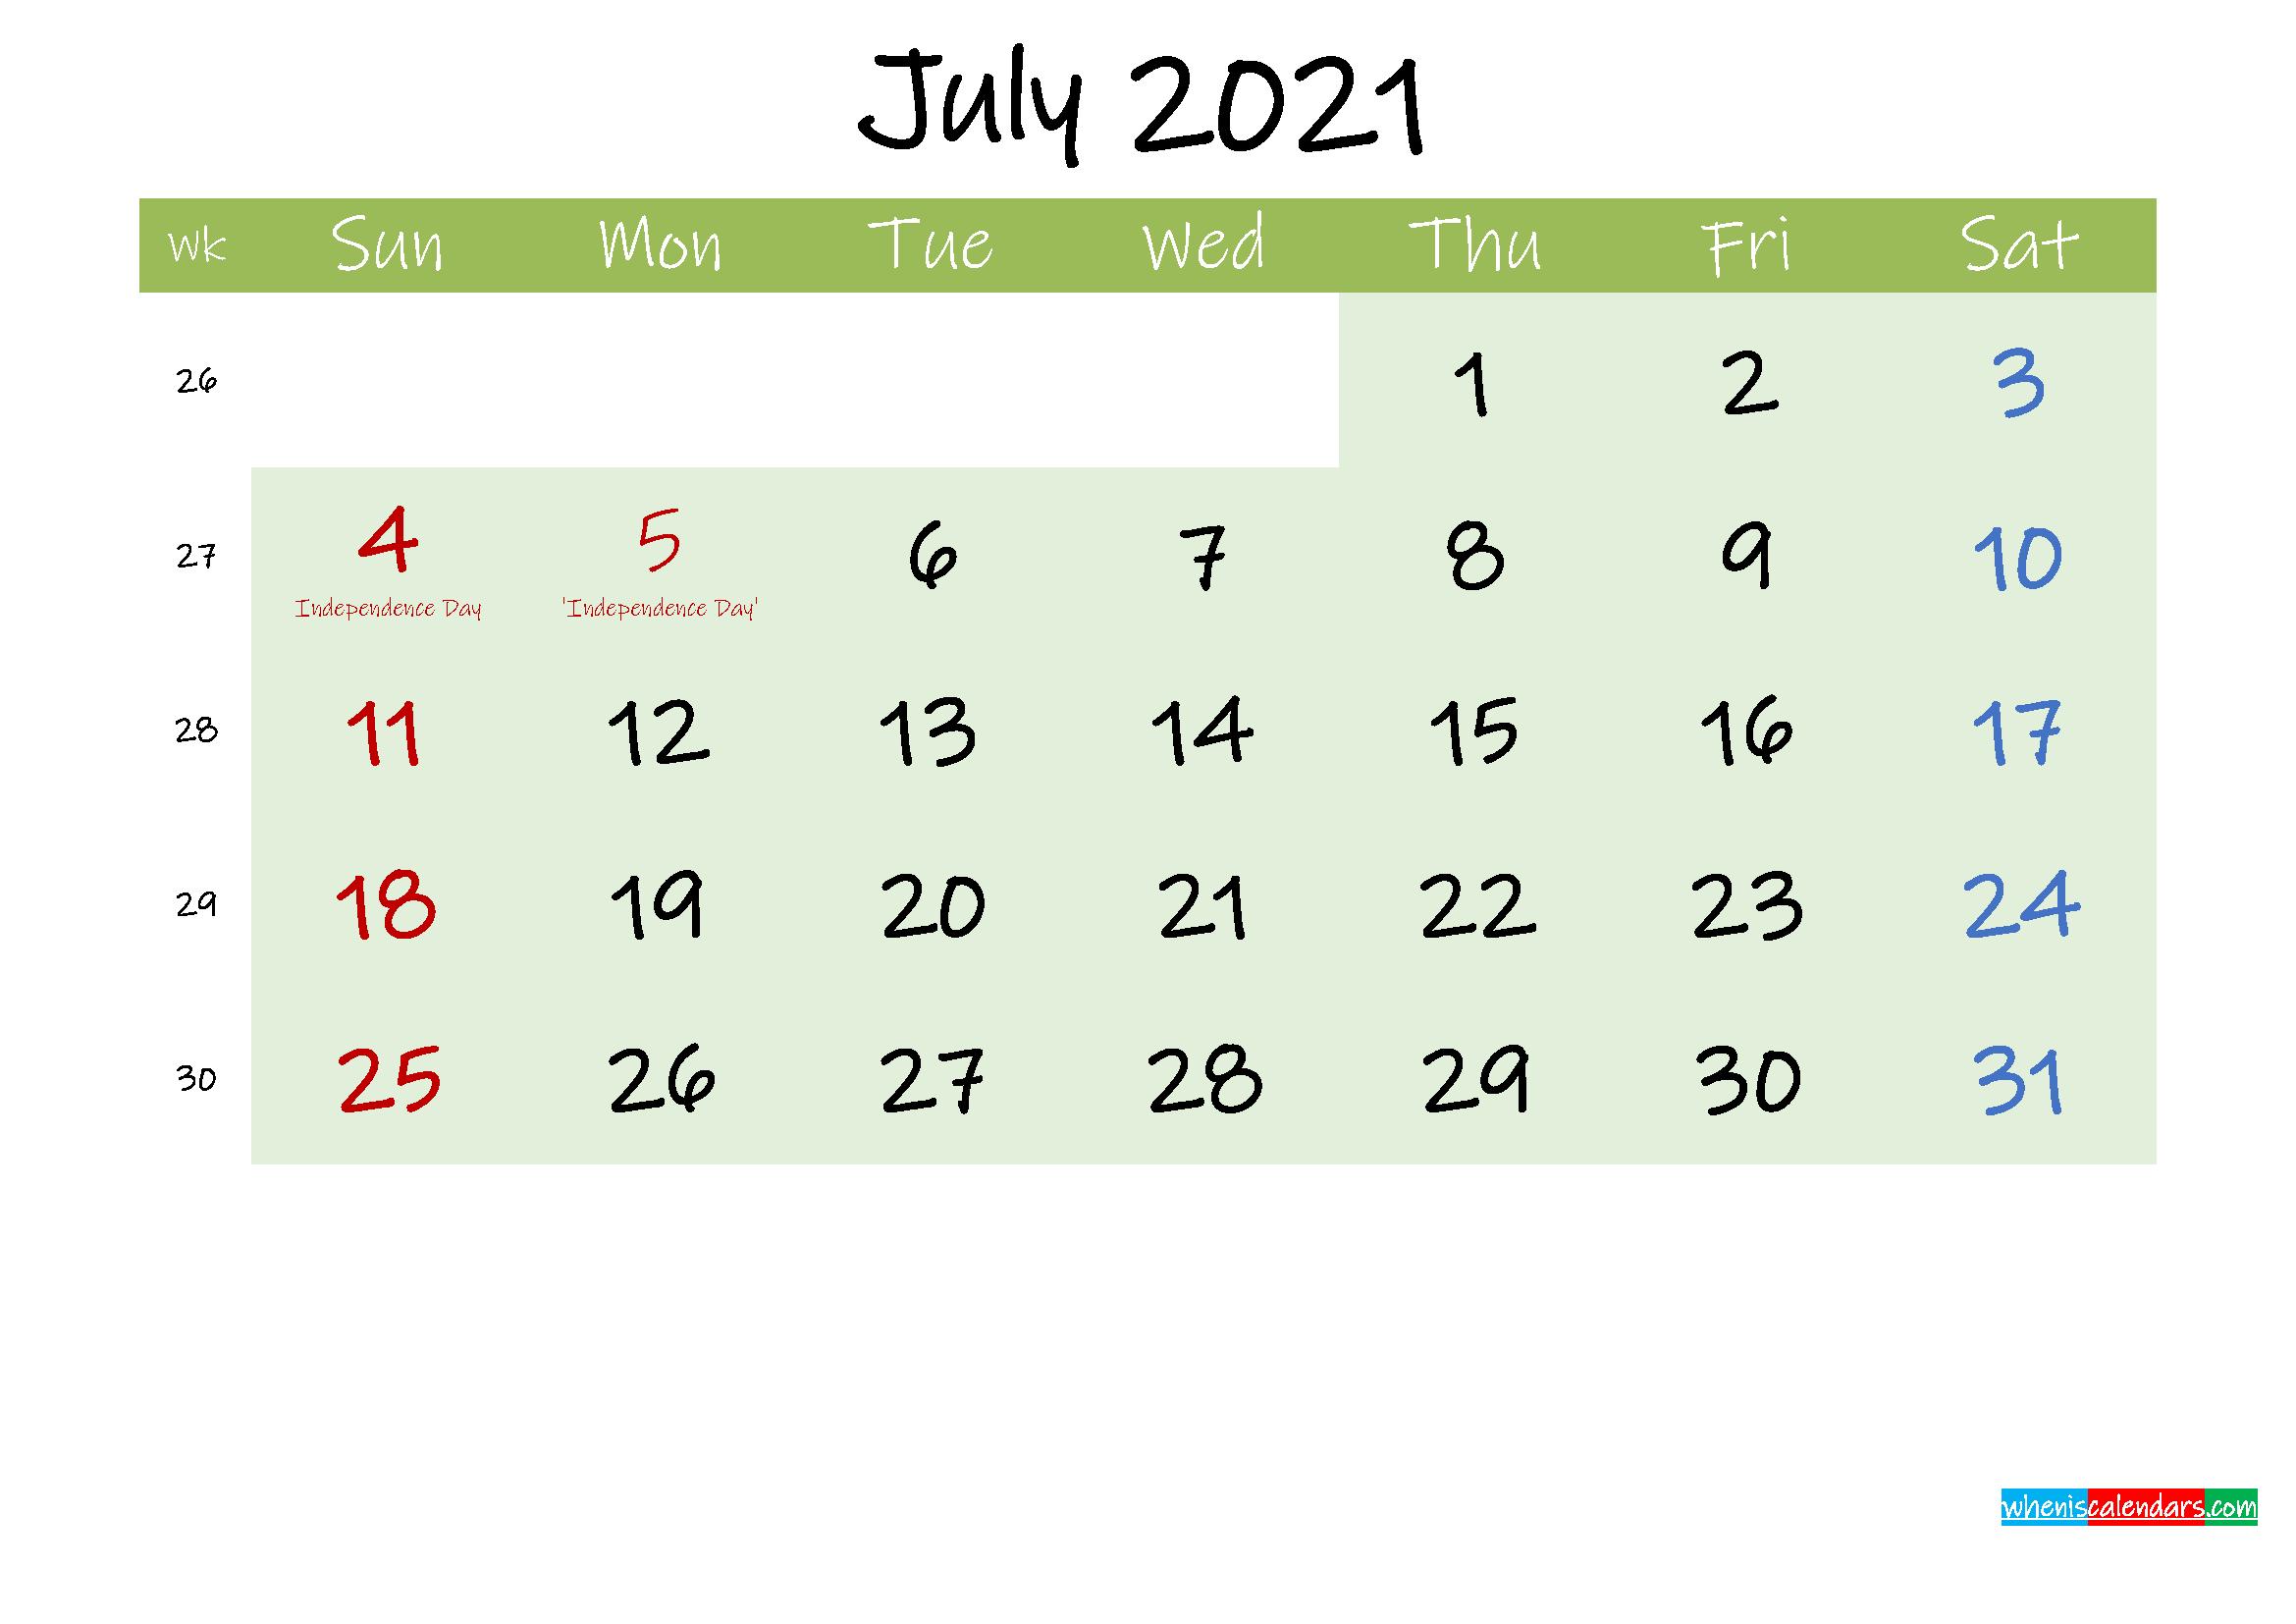 July 2021 Calendar with Holidays Printable